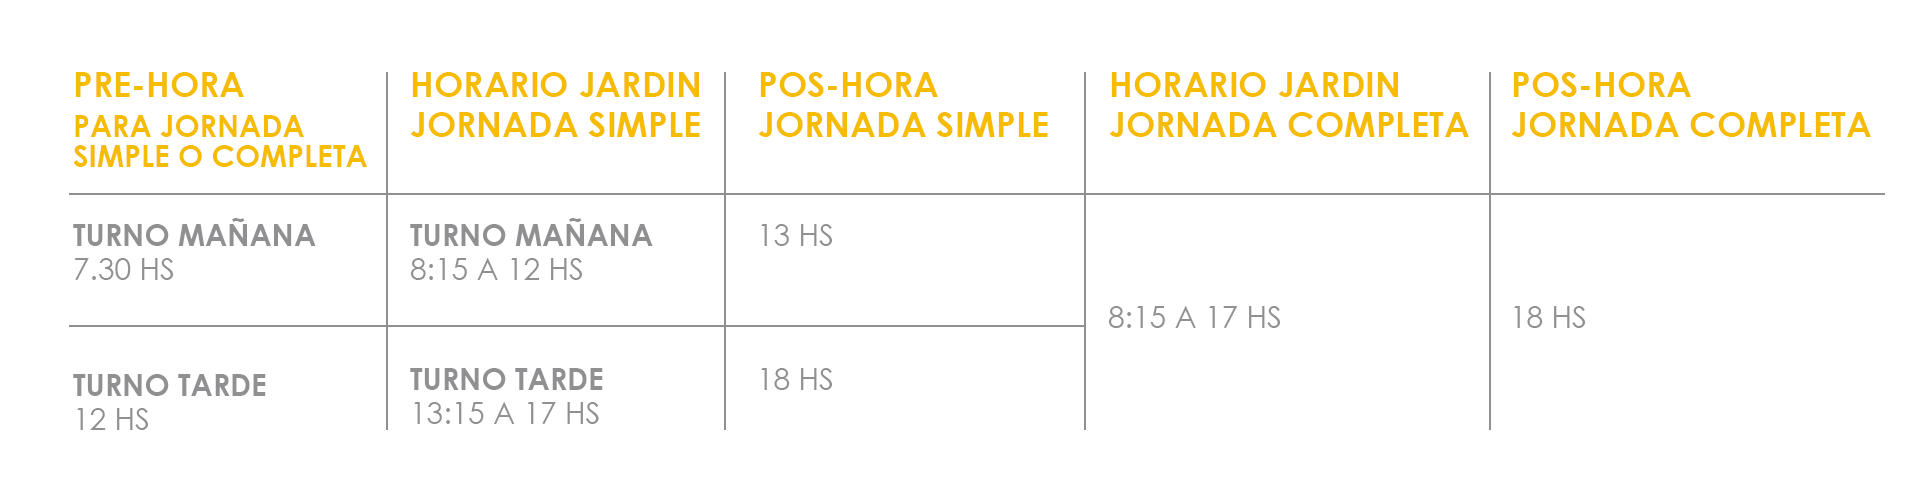 HORARIOS-new.png